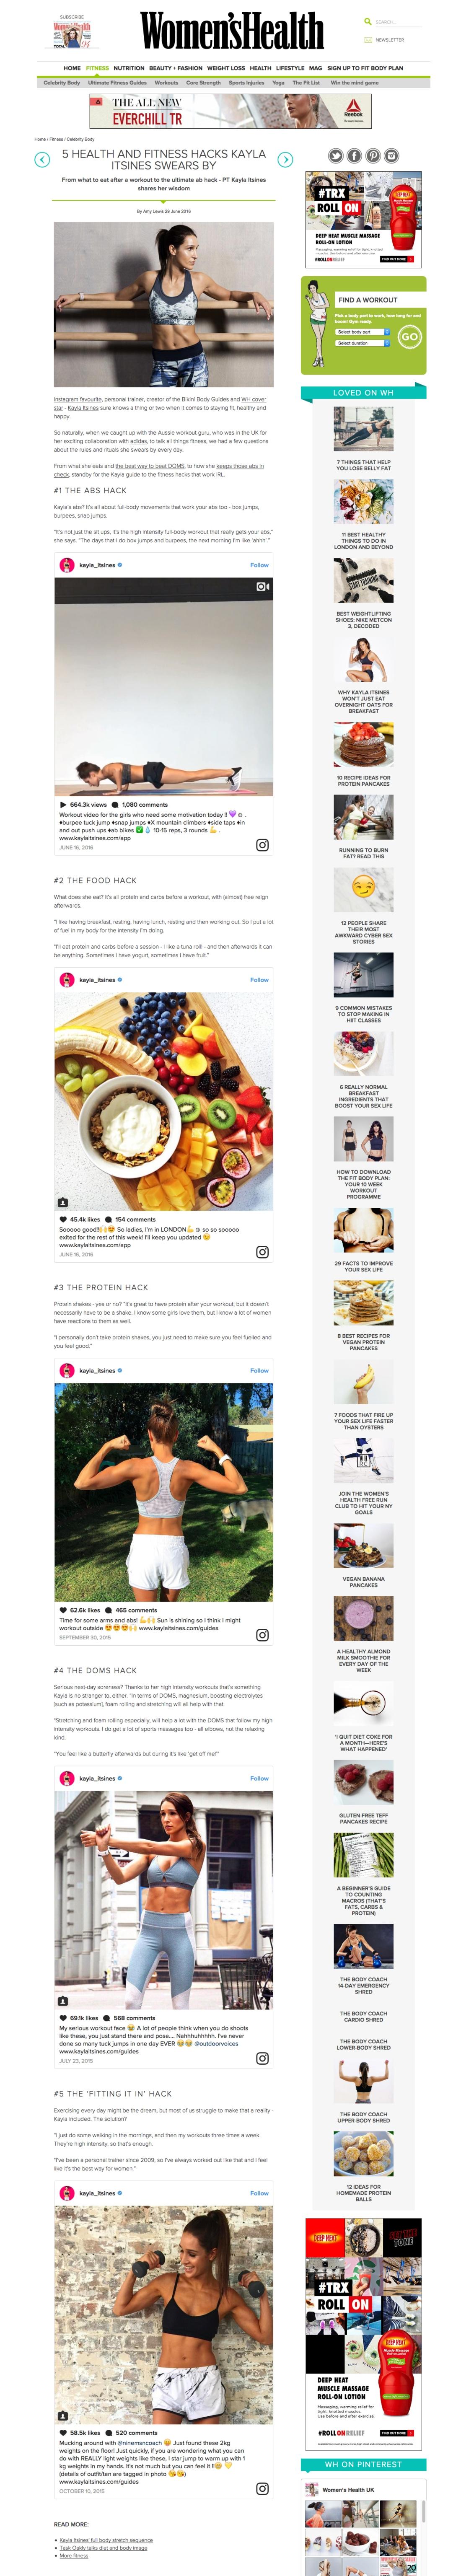 5 Health And Fitness Hacks Kayla Itsines Swears By